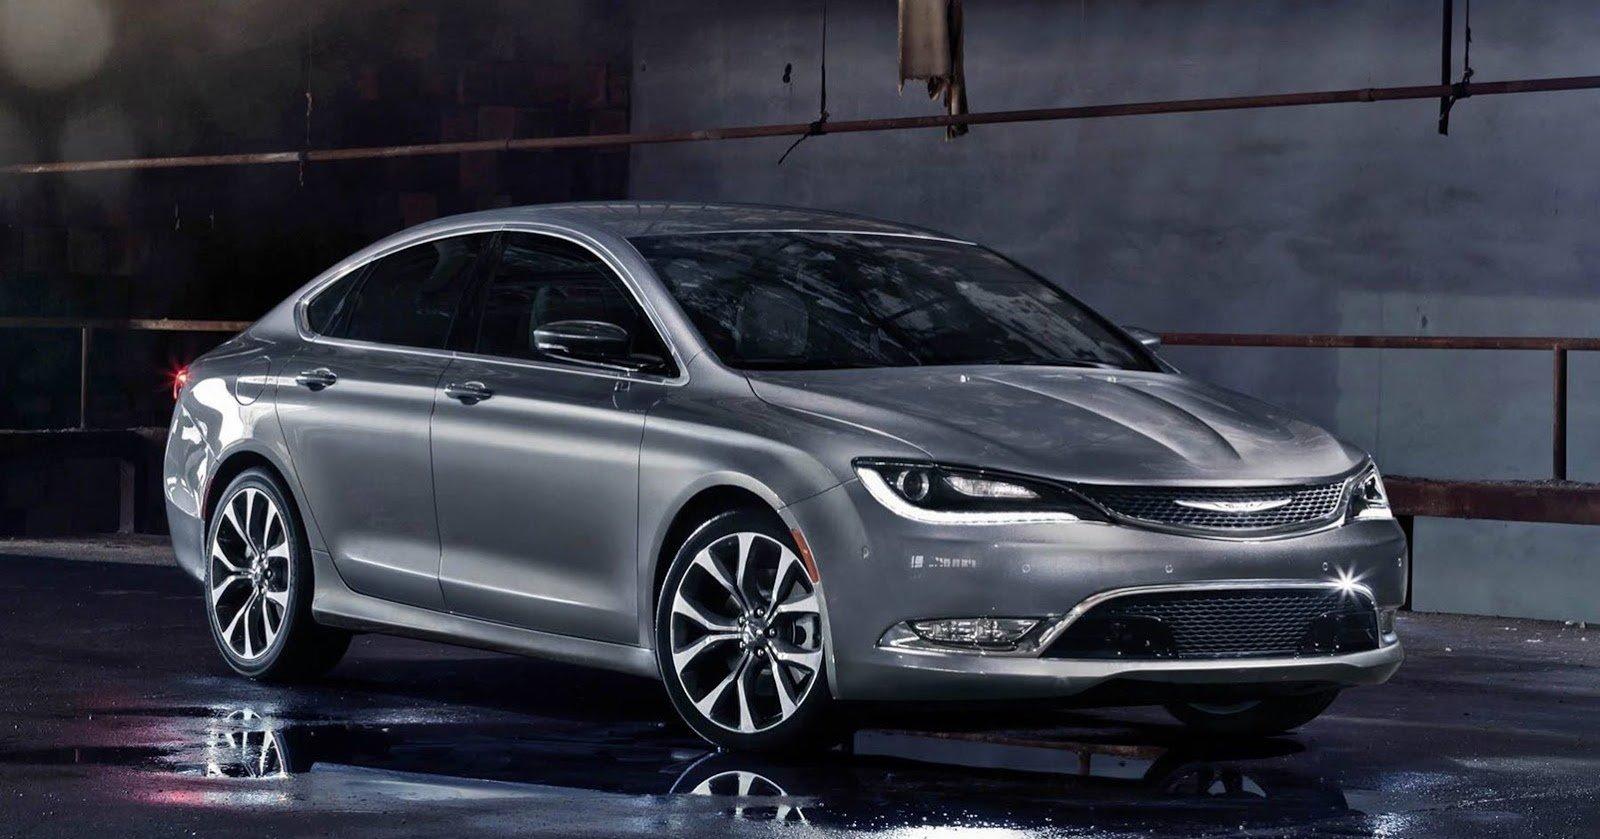 2015 chrysler 200 new american d segment sedan image 221174. Black Bedroom Furniture Sets. Home Design Ideas